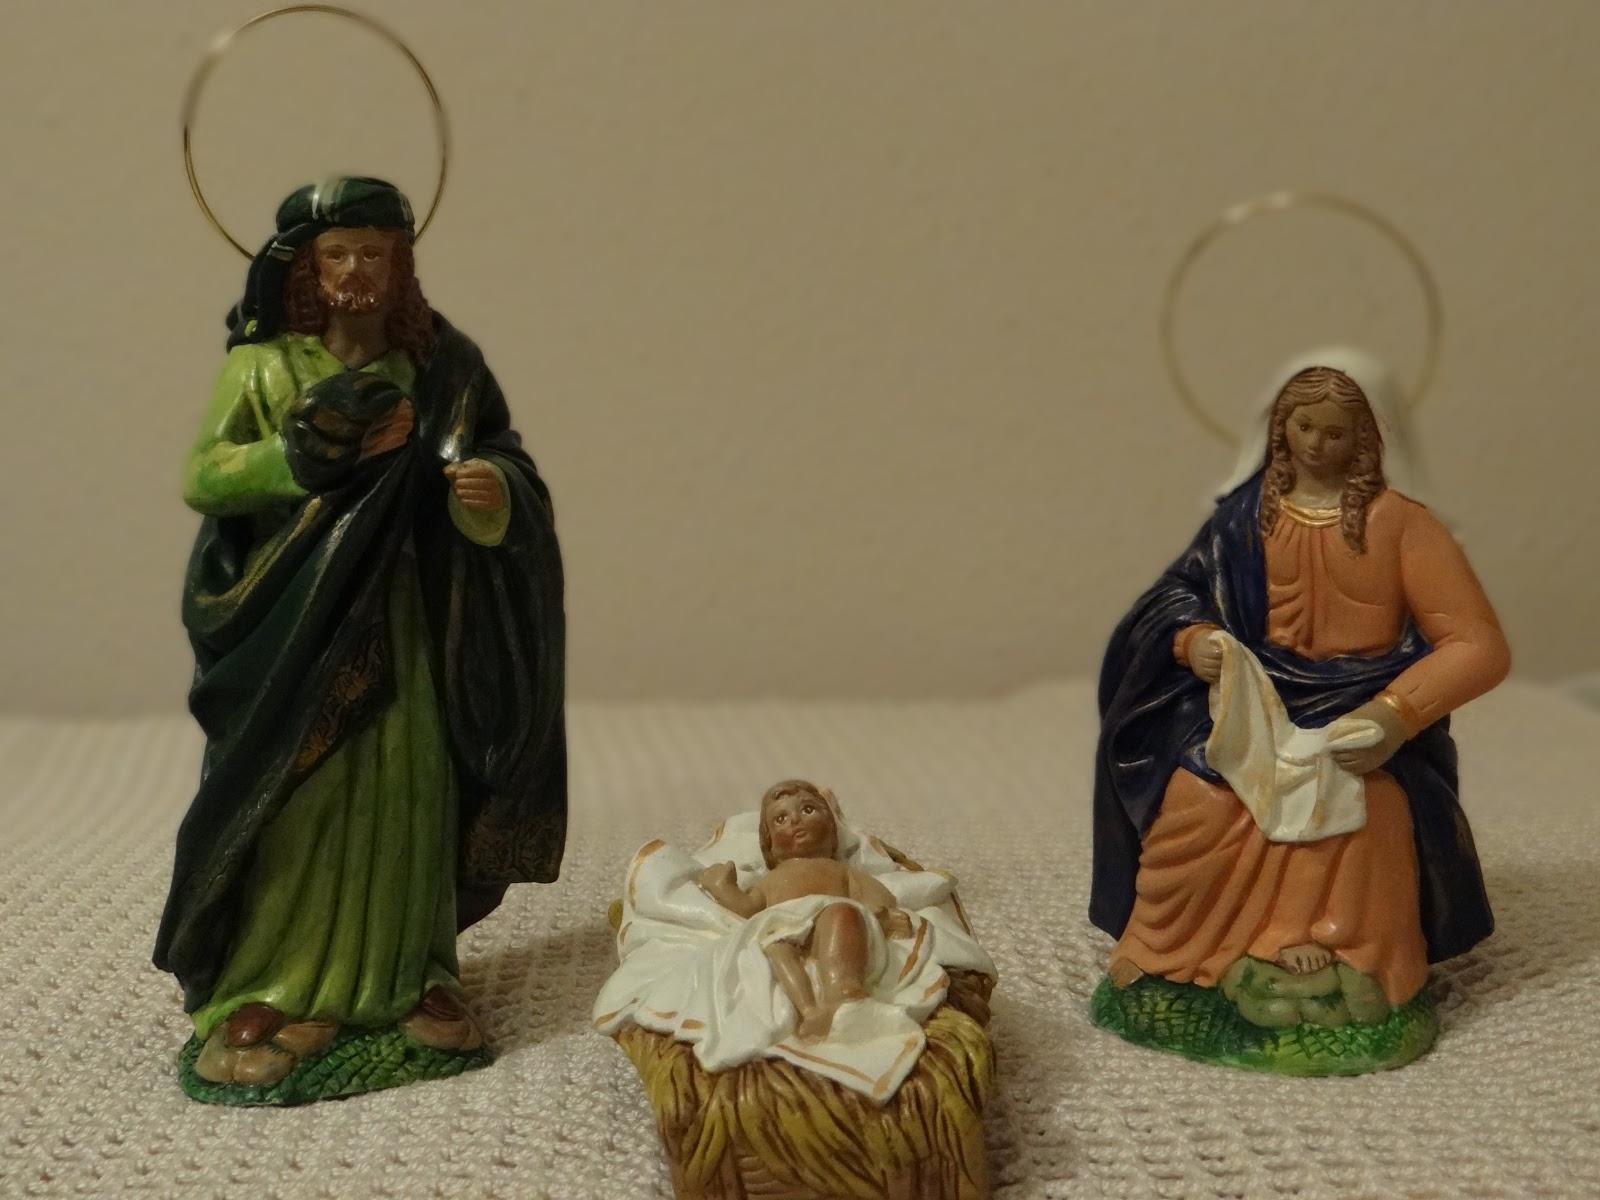 Tu rinc n del punto bel n navide o pintado a mano - Belen navideno manualidades ...